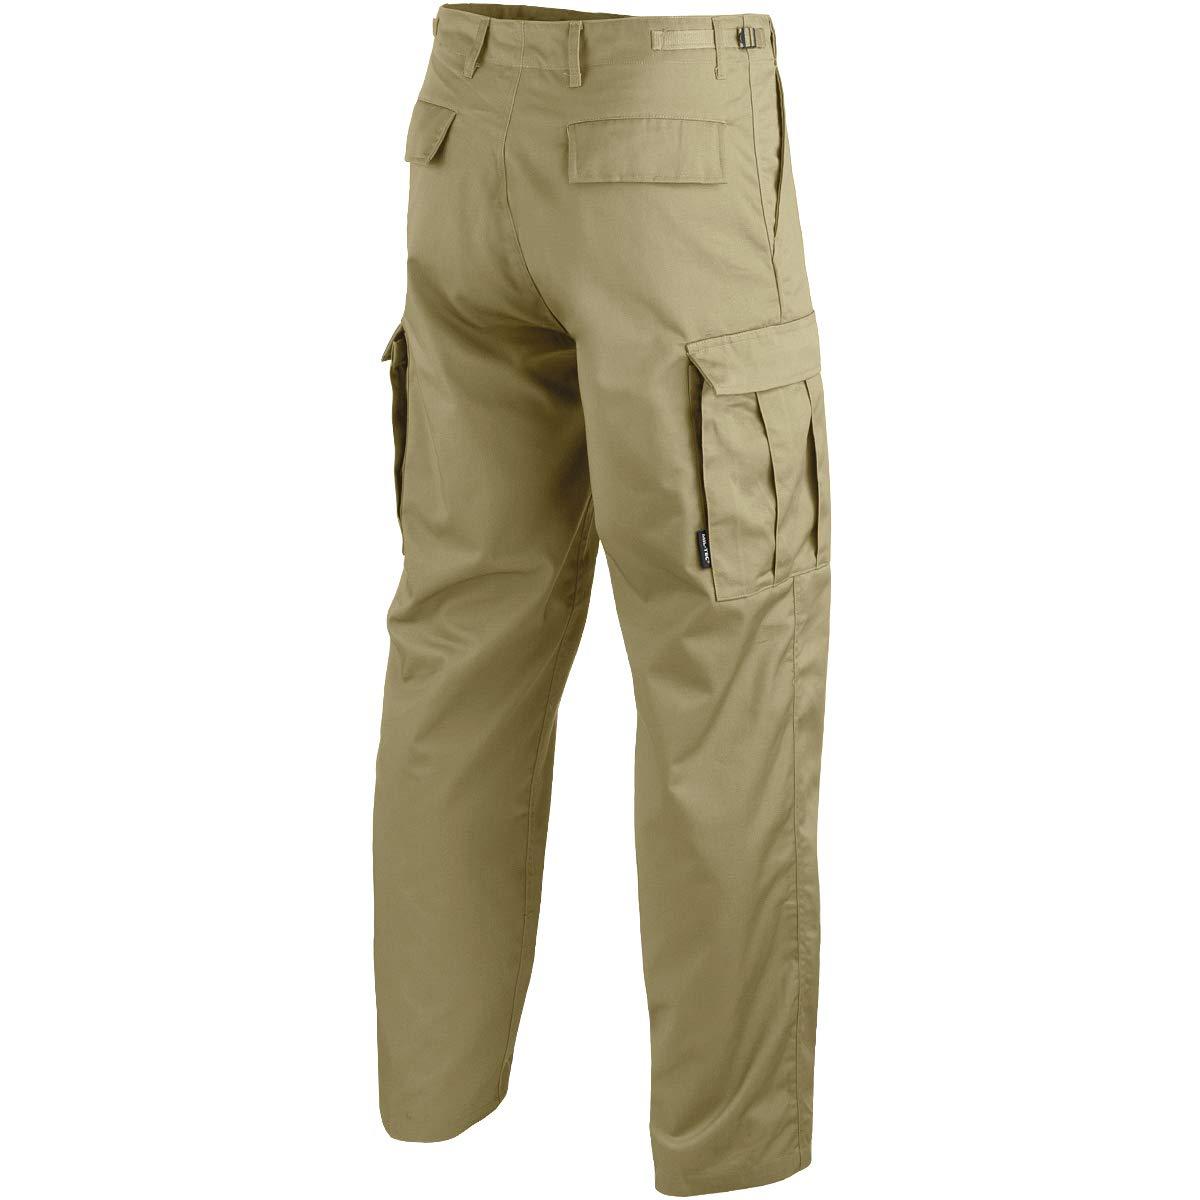 43a854238b76d8 Mil-Tec BDU Ranger Combat Trousers Khaki: Amazon.co.uk: Clothing